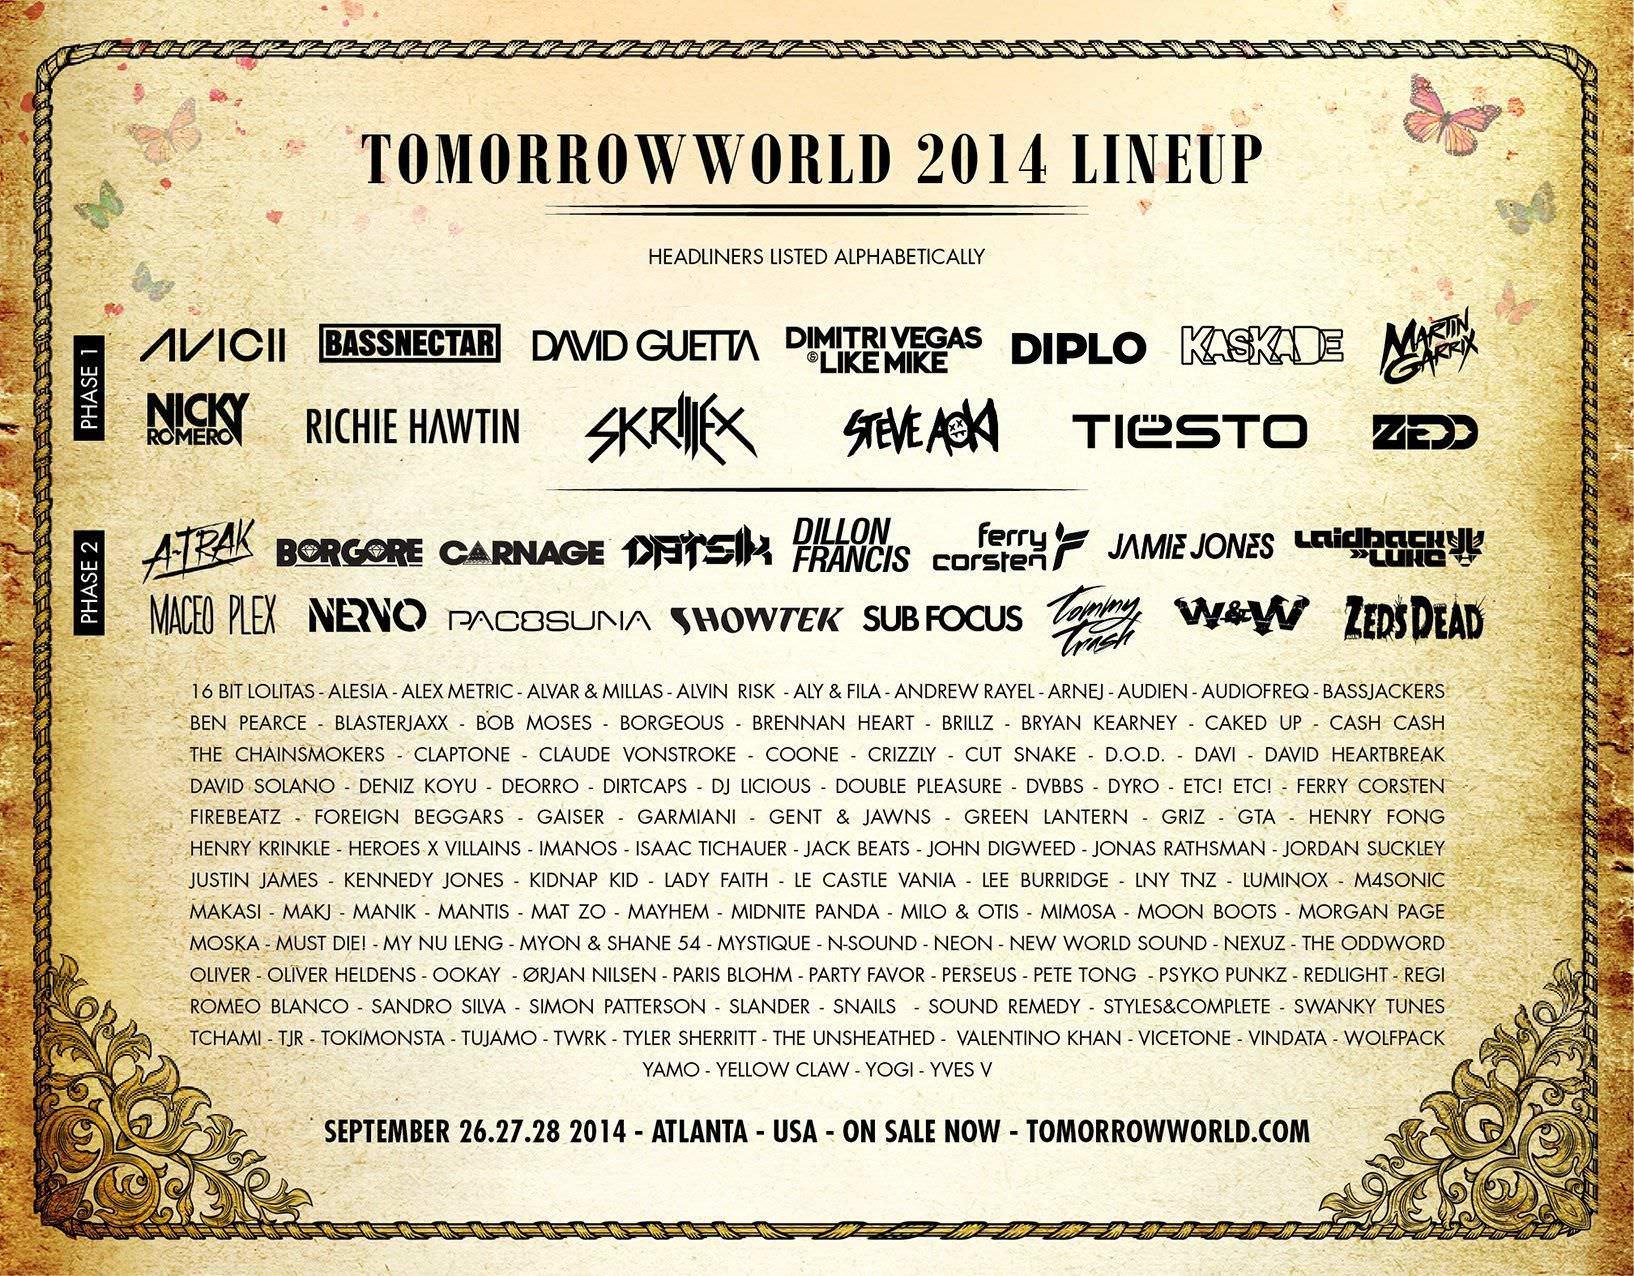 ¡Lineup Tomorrowland 2014!